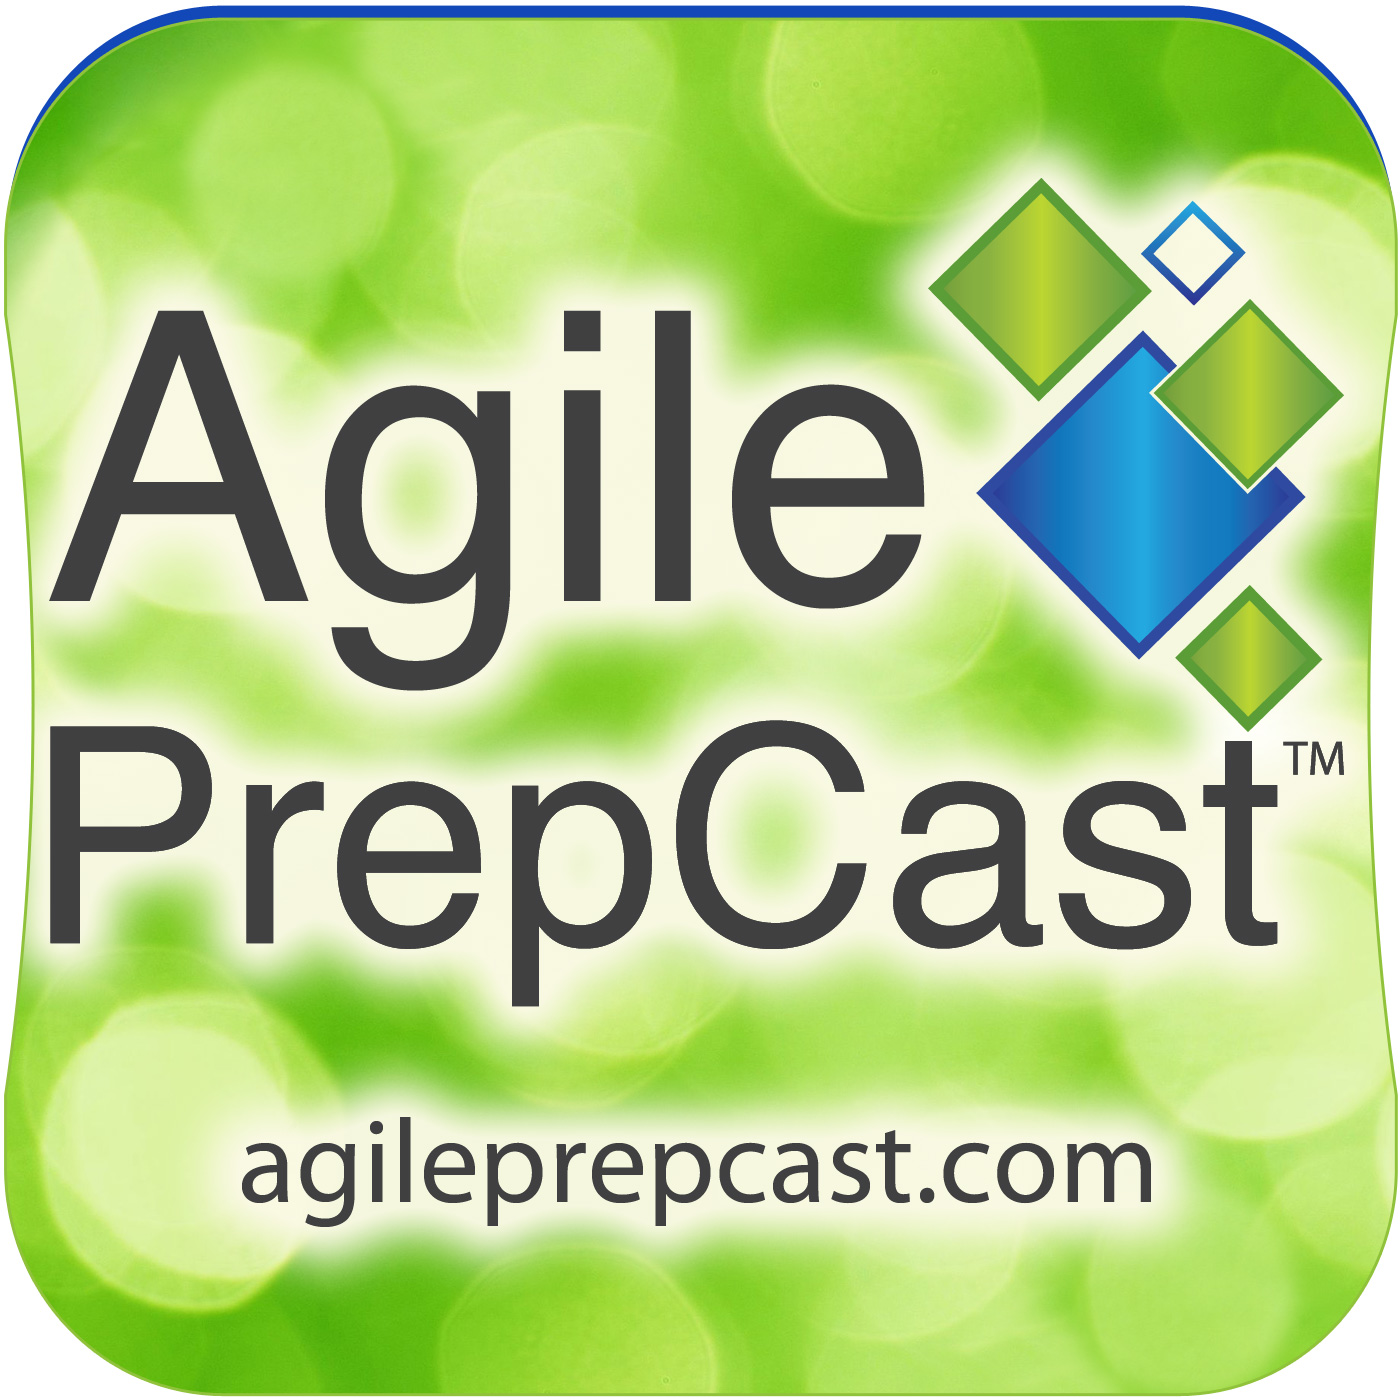 The Agile PrepCast & PMI-ACP Exam Simulator (90-Day Access) Bundle